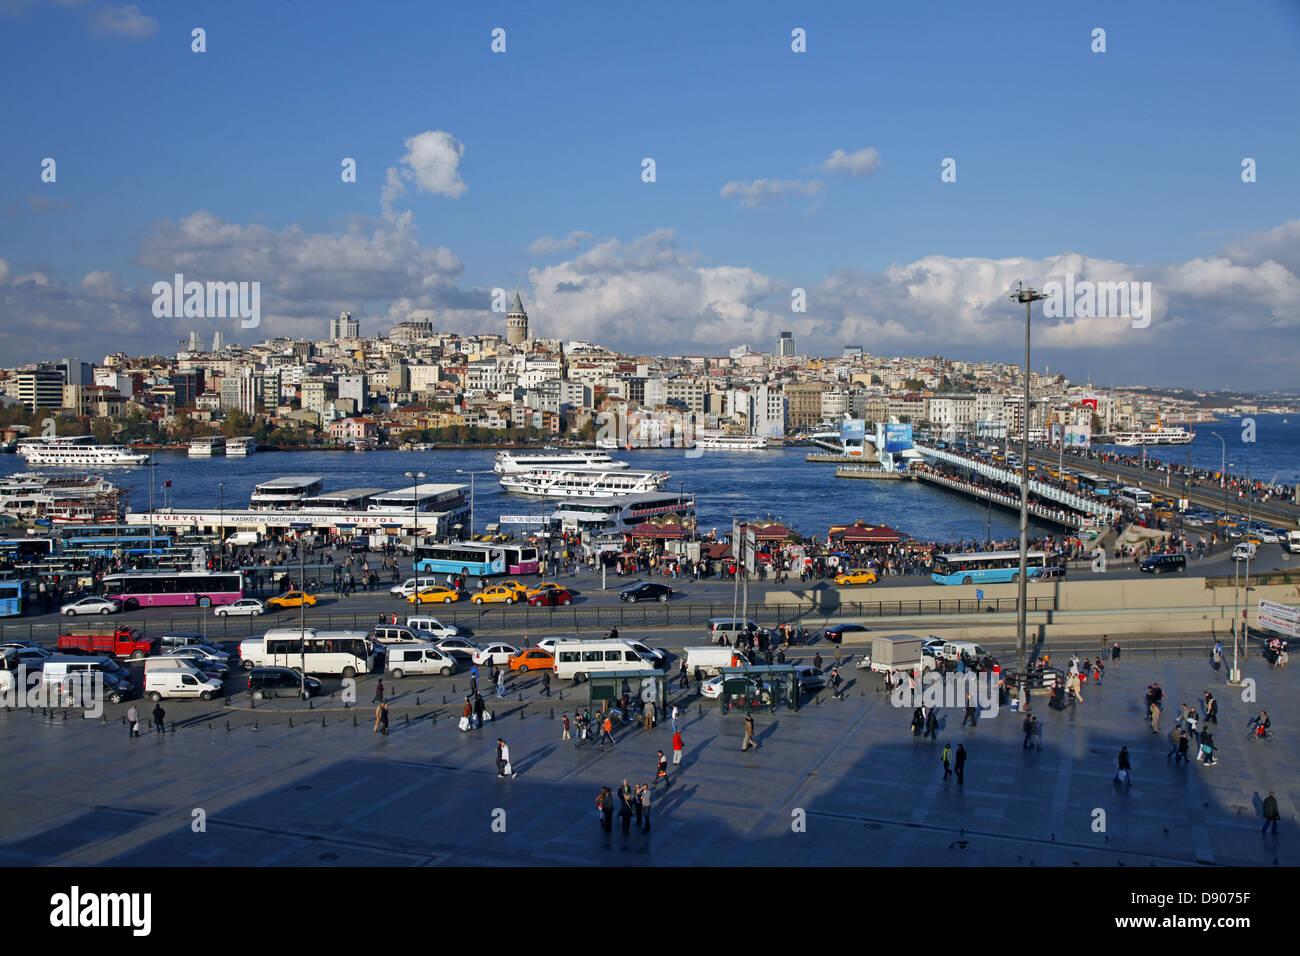 GOLDEN HORN & GALATA BRIDGE BEYOGLU ISTANBUL TURKEY 11 November 2012 - Stock Image